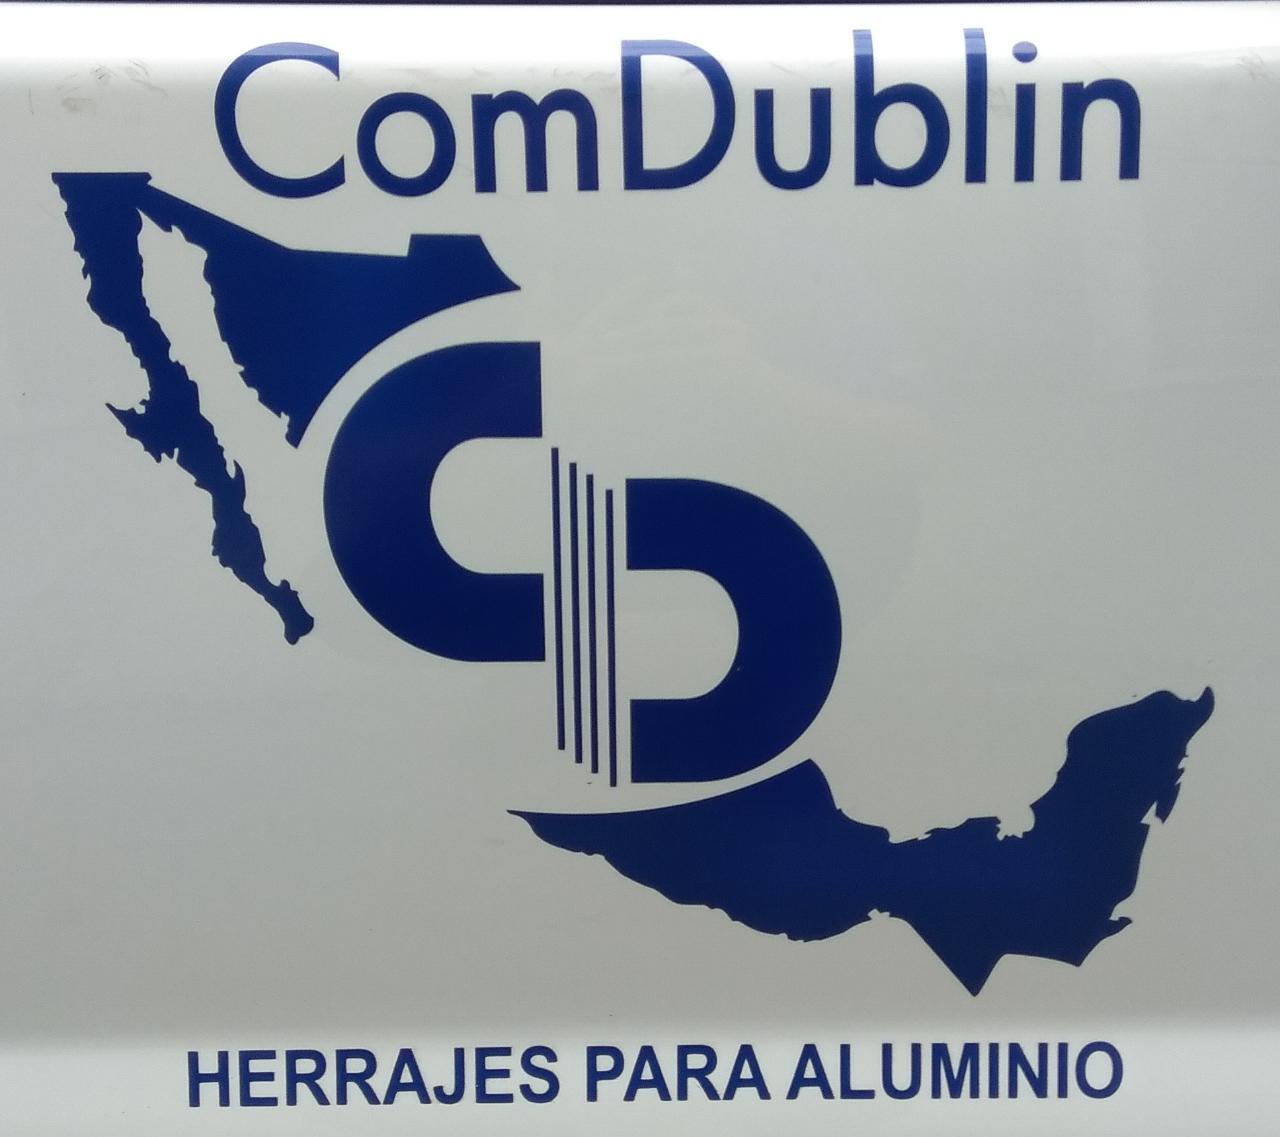 ComDublin